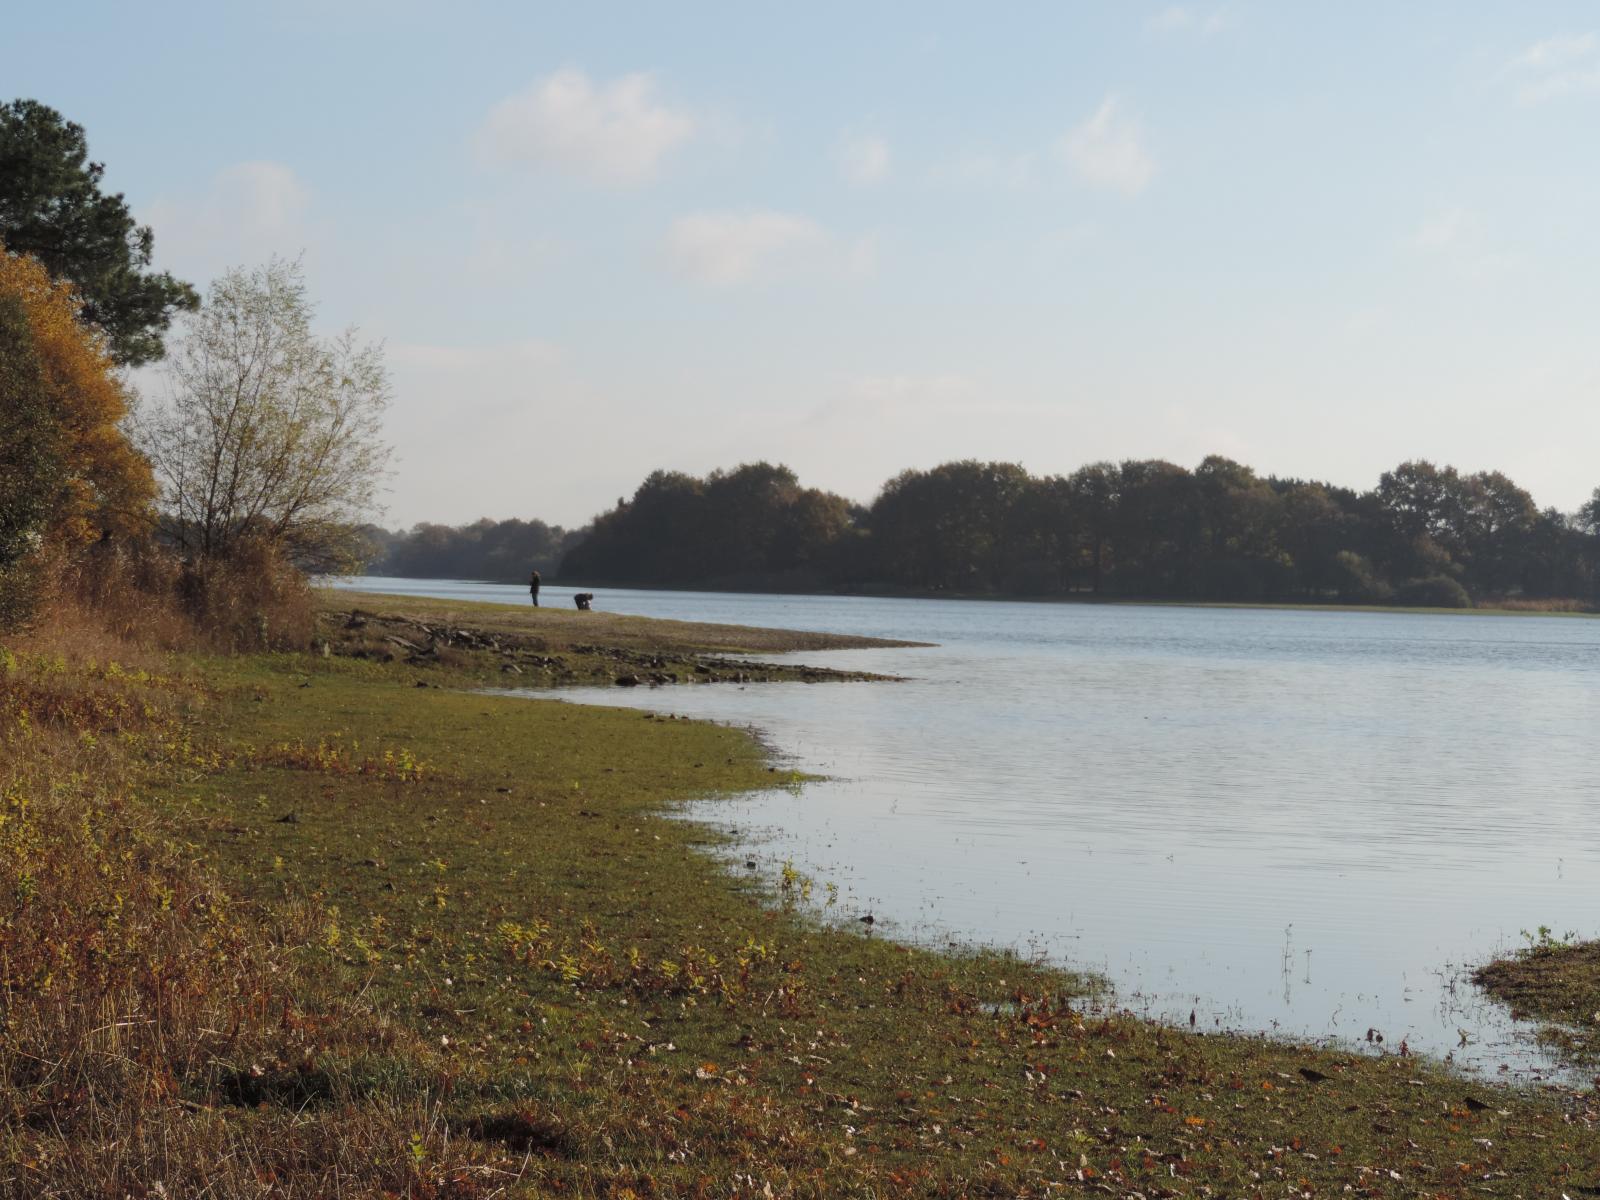 Lake Vioreau